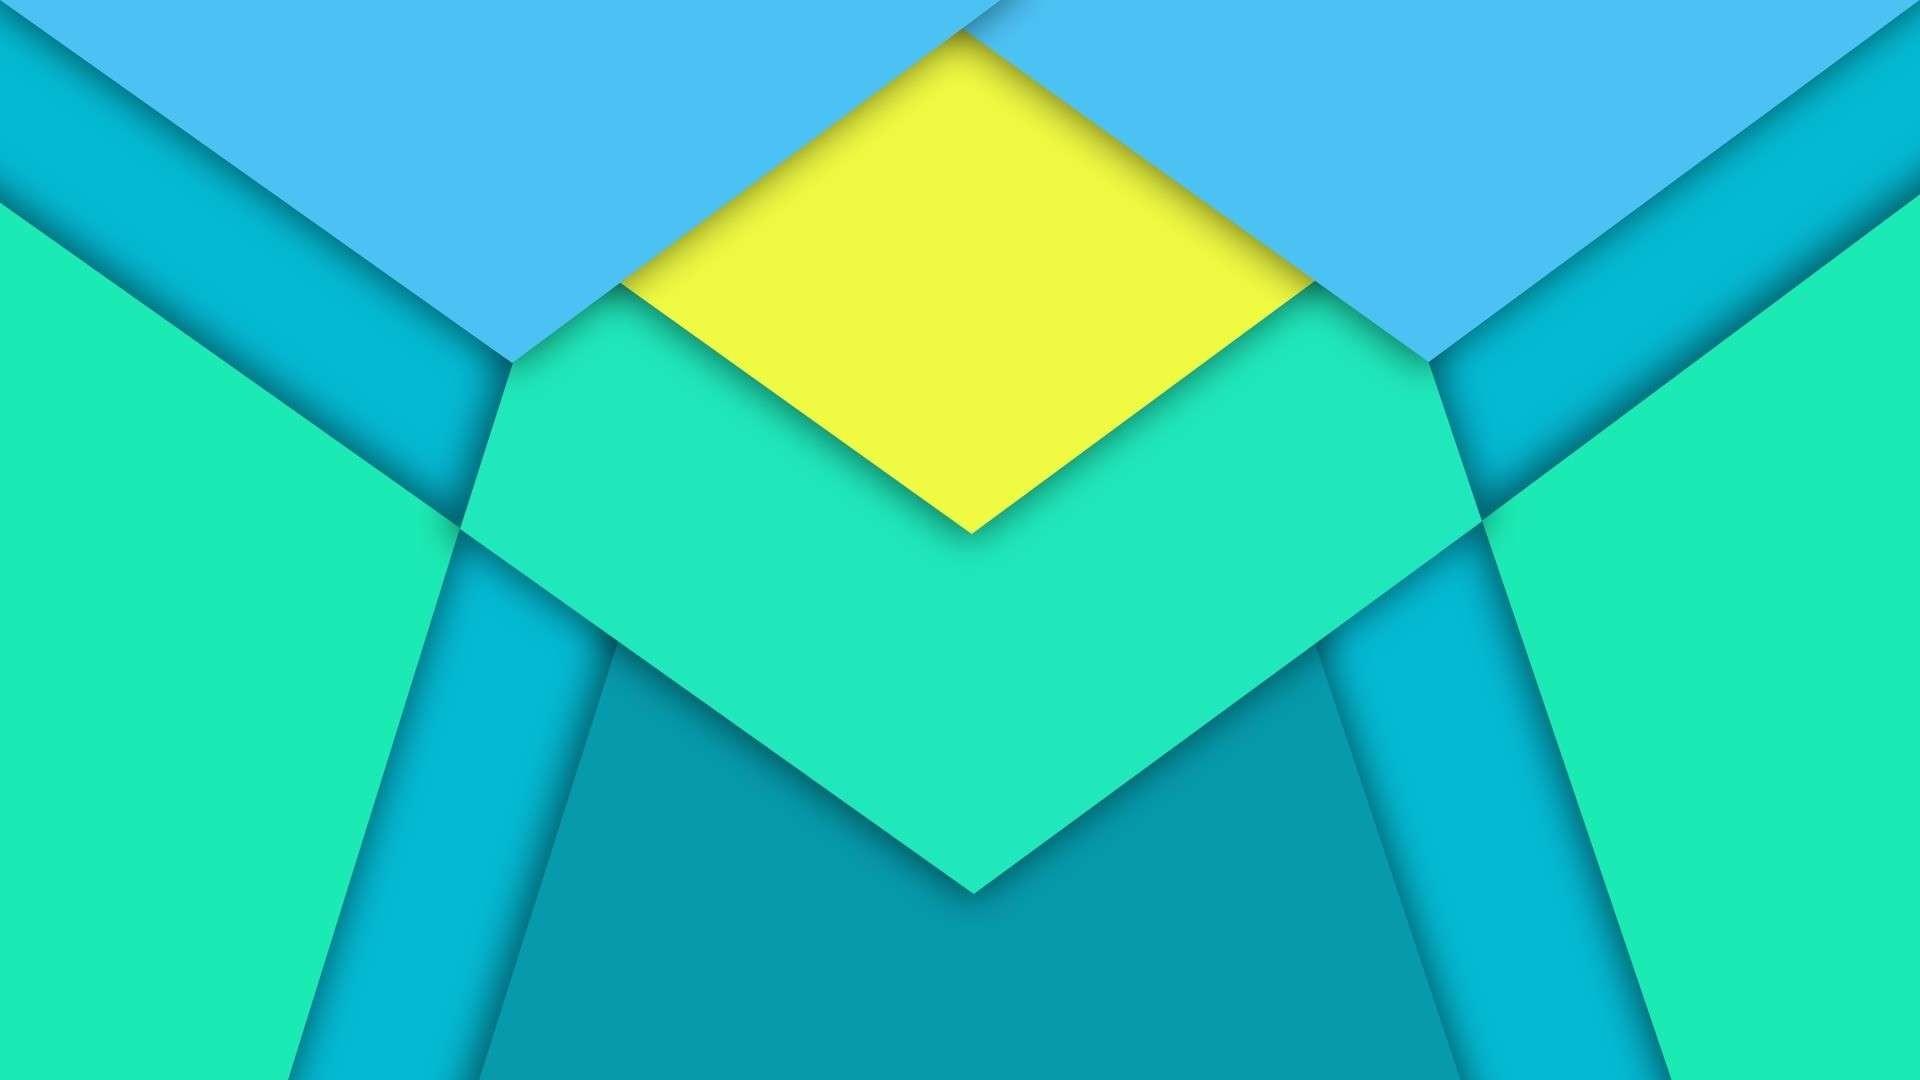 minimalism triangle diamonds material design